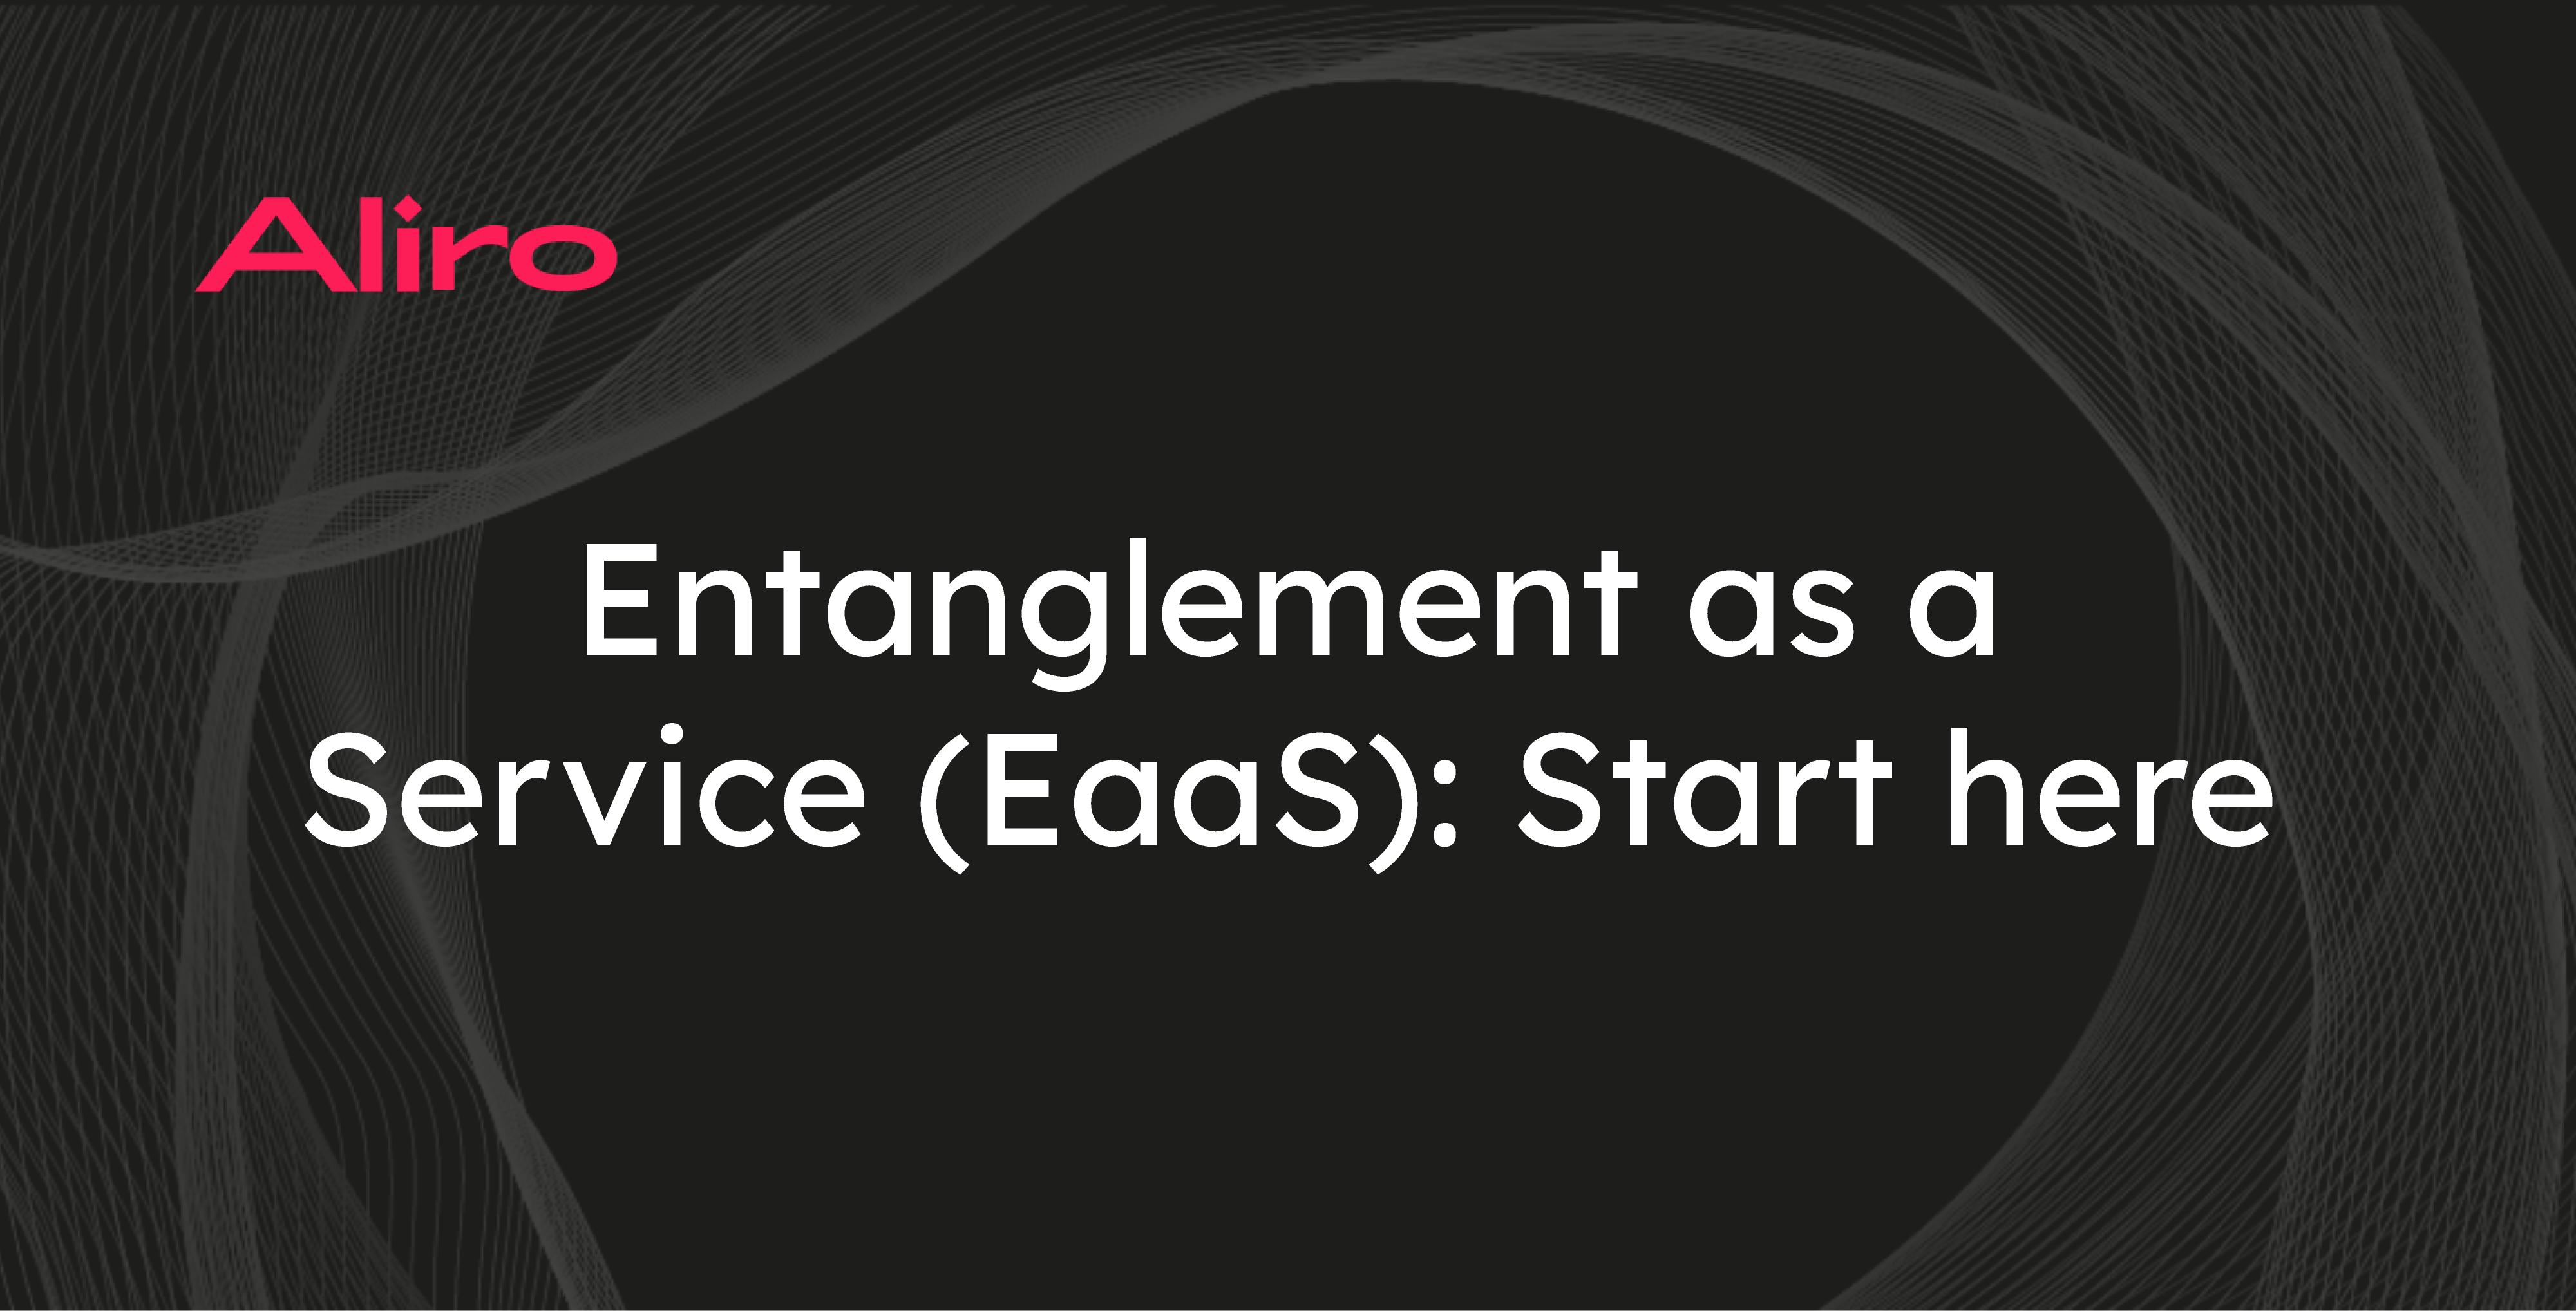 Entanglement as a Service (EaaS): Start here